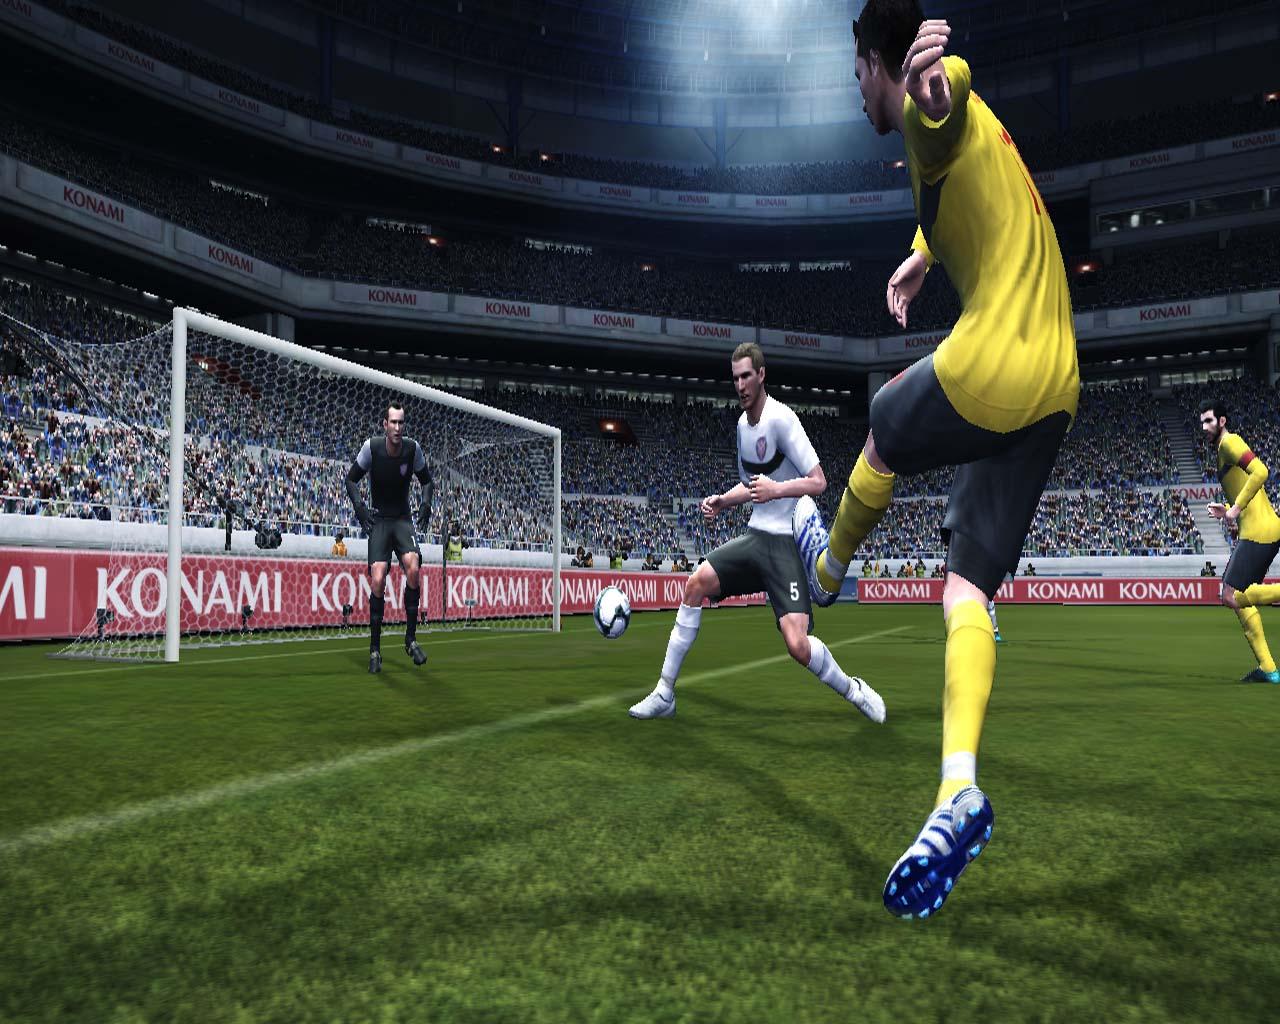 Pro Evolution Soccer 2011 - král je mrtev? 23551